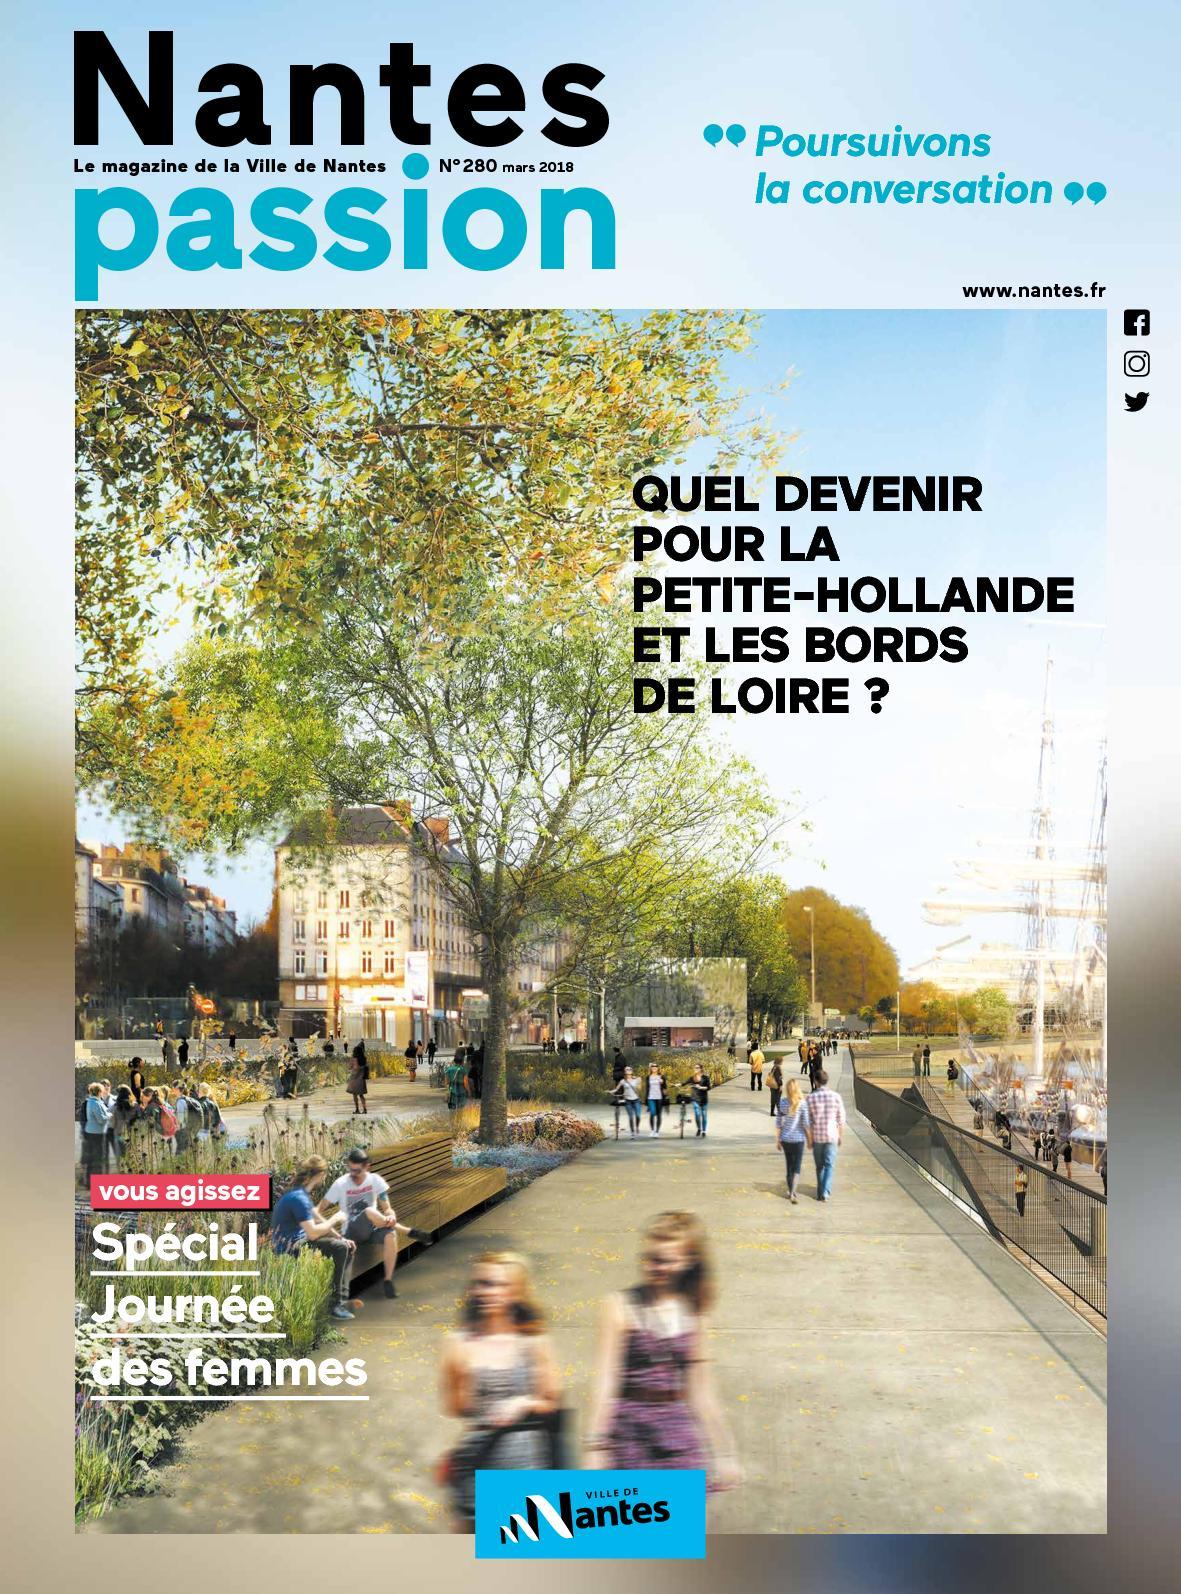 Ma Petite Chaise Nantes calaméo - nantes passion n°280 mars 2018